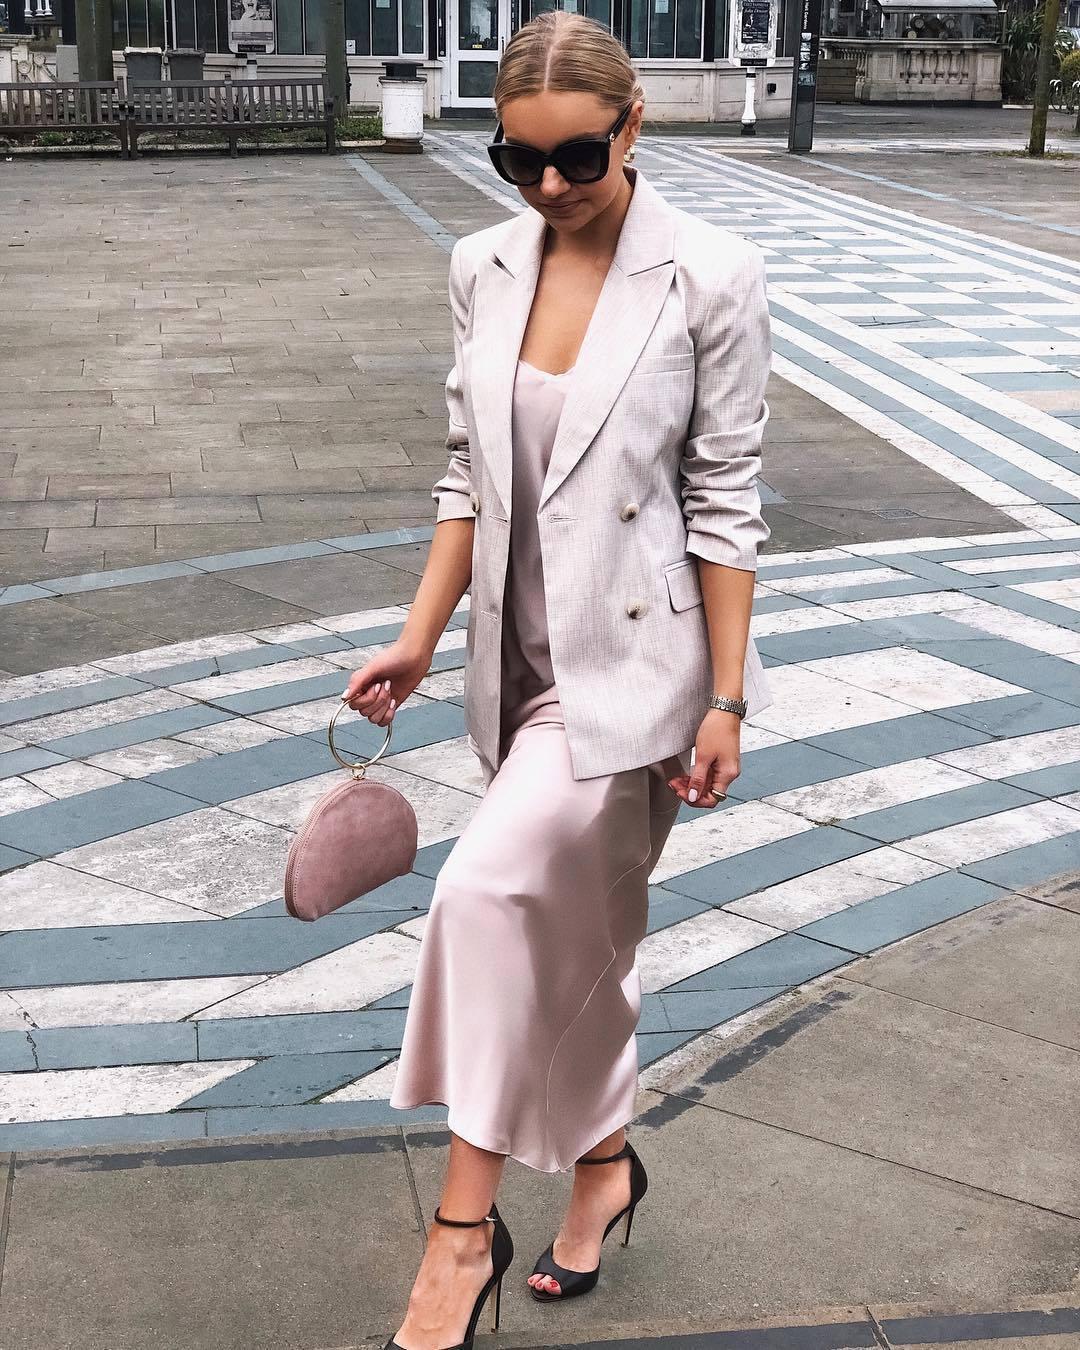 jacket blazer double breasted maxi dress slip dress black sandals handbag sunglasses elegant